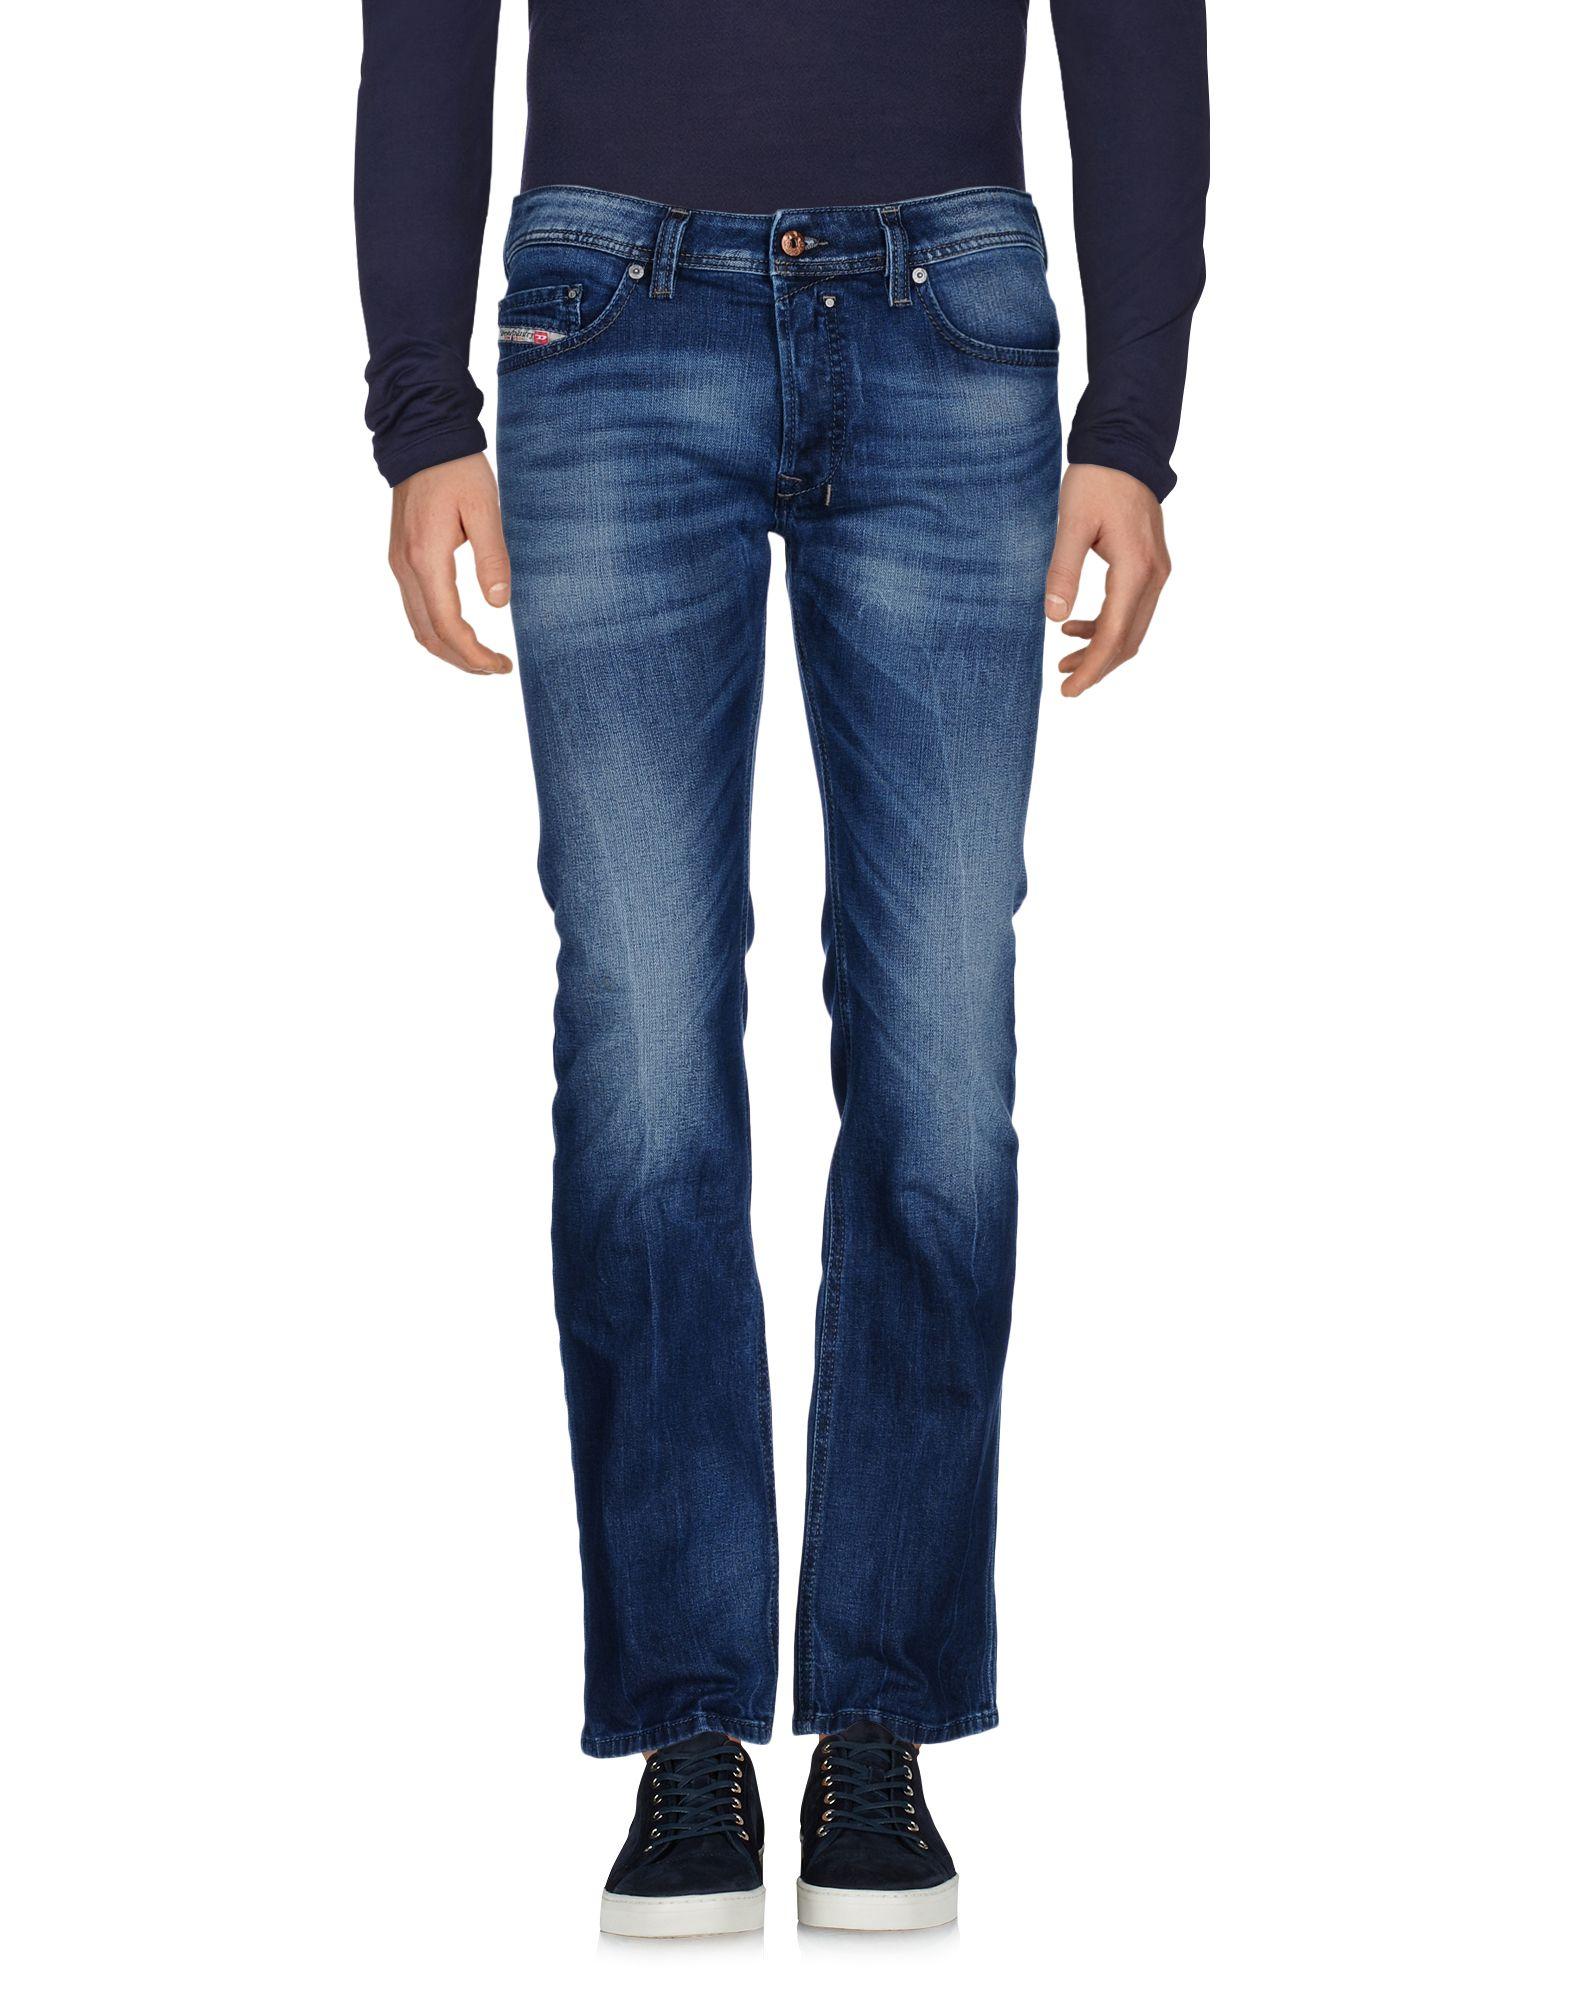 jeans homme diesel safado jusqu 70 soldes deuxi me d marque. Black Bedroom Furniture Sets. Home Design Ideas